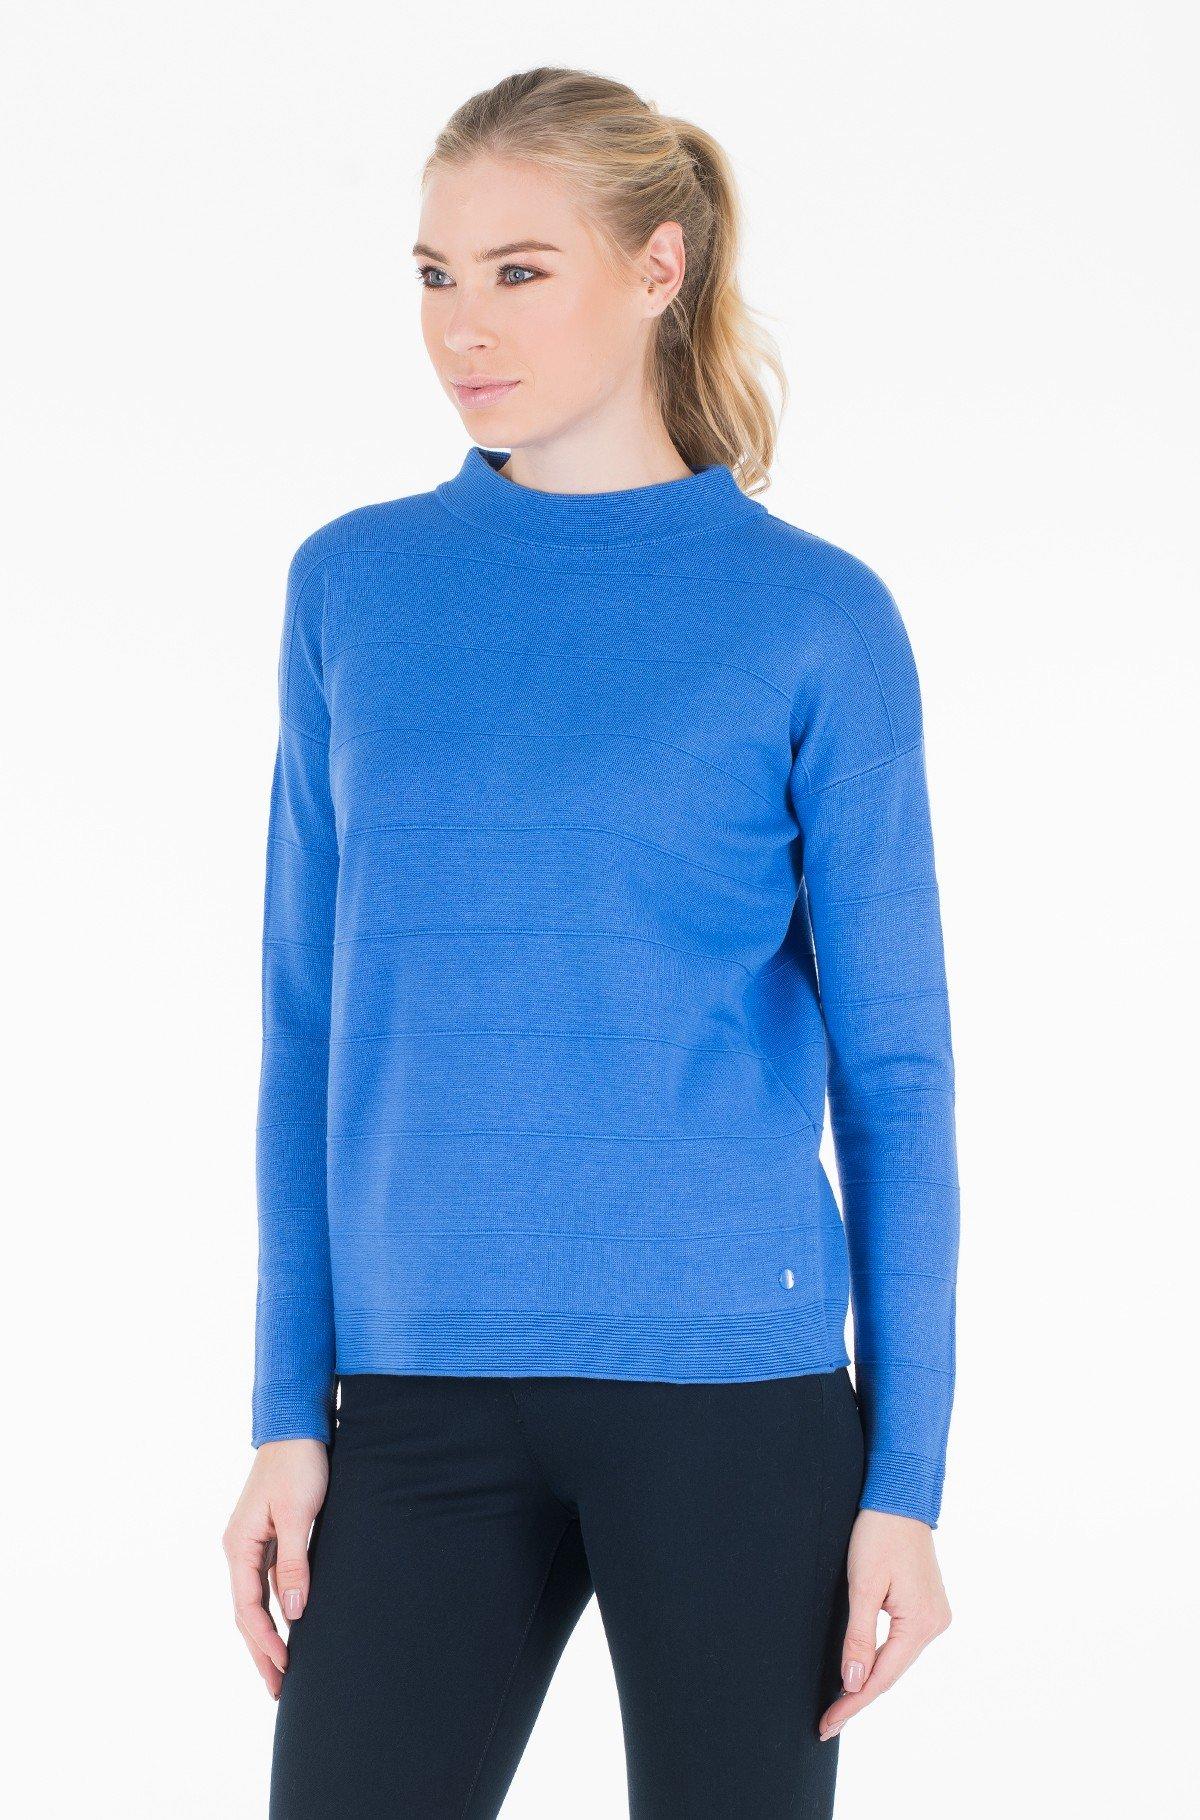 Sweater 1013439-full-1